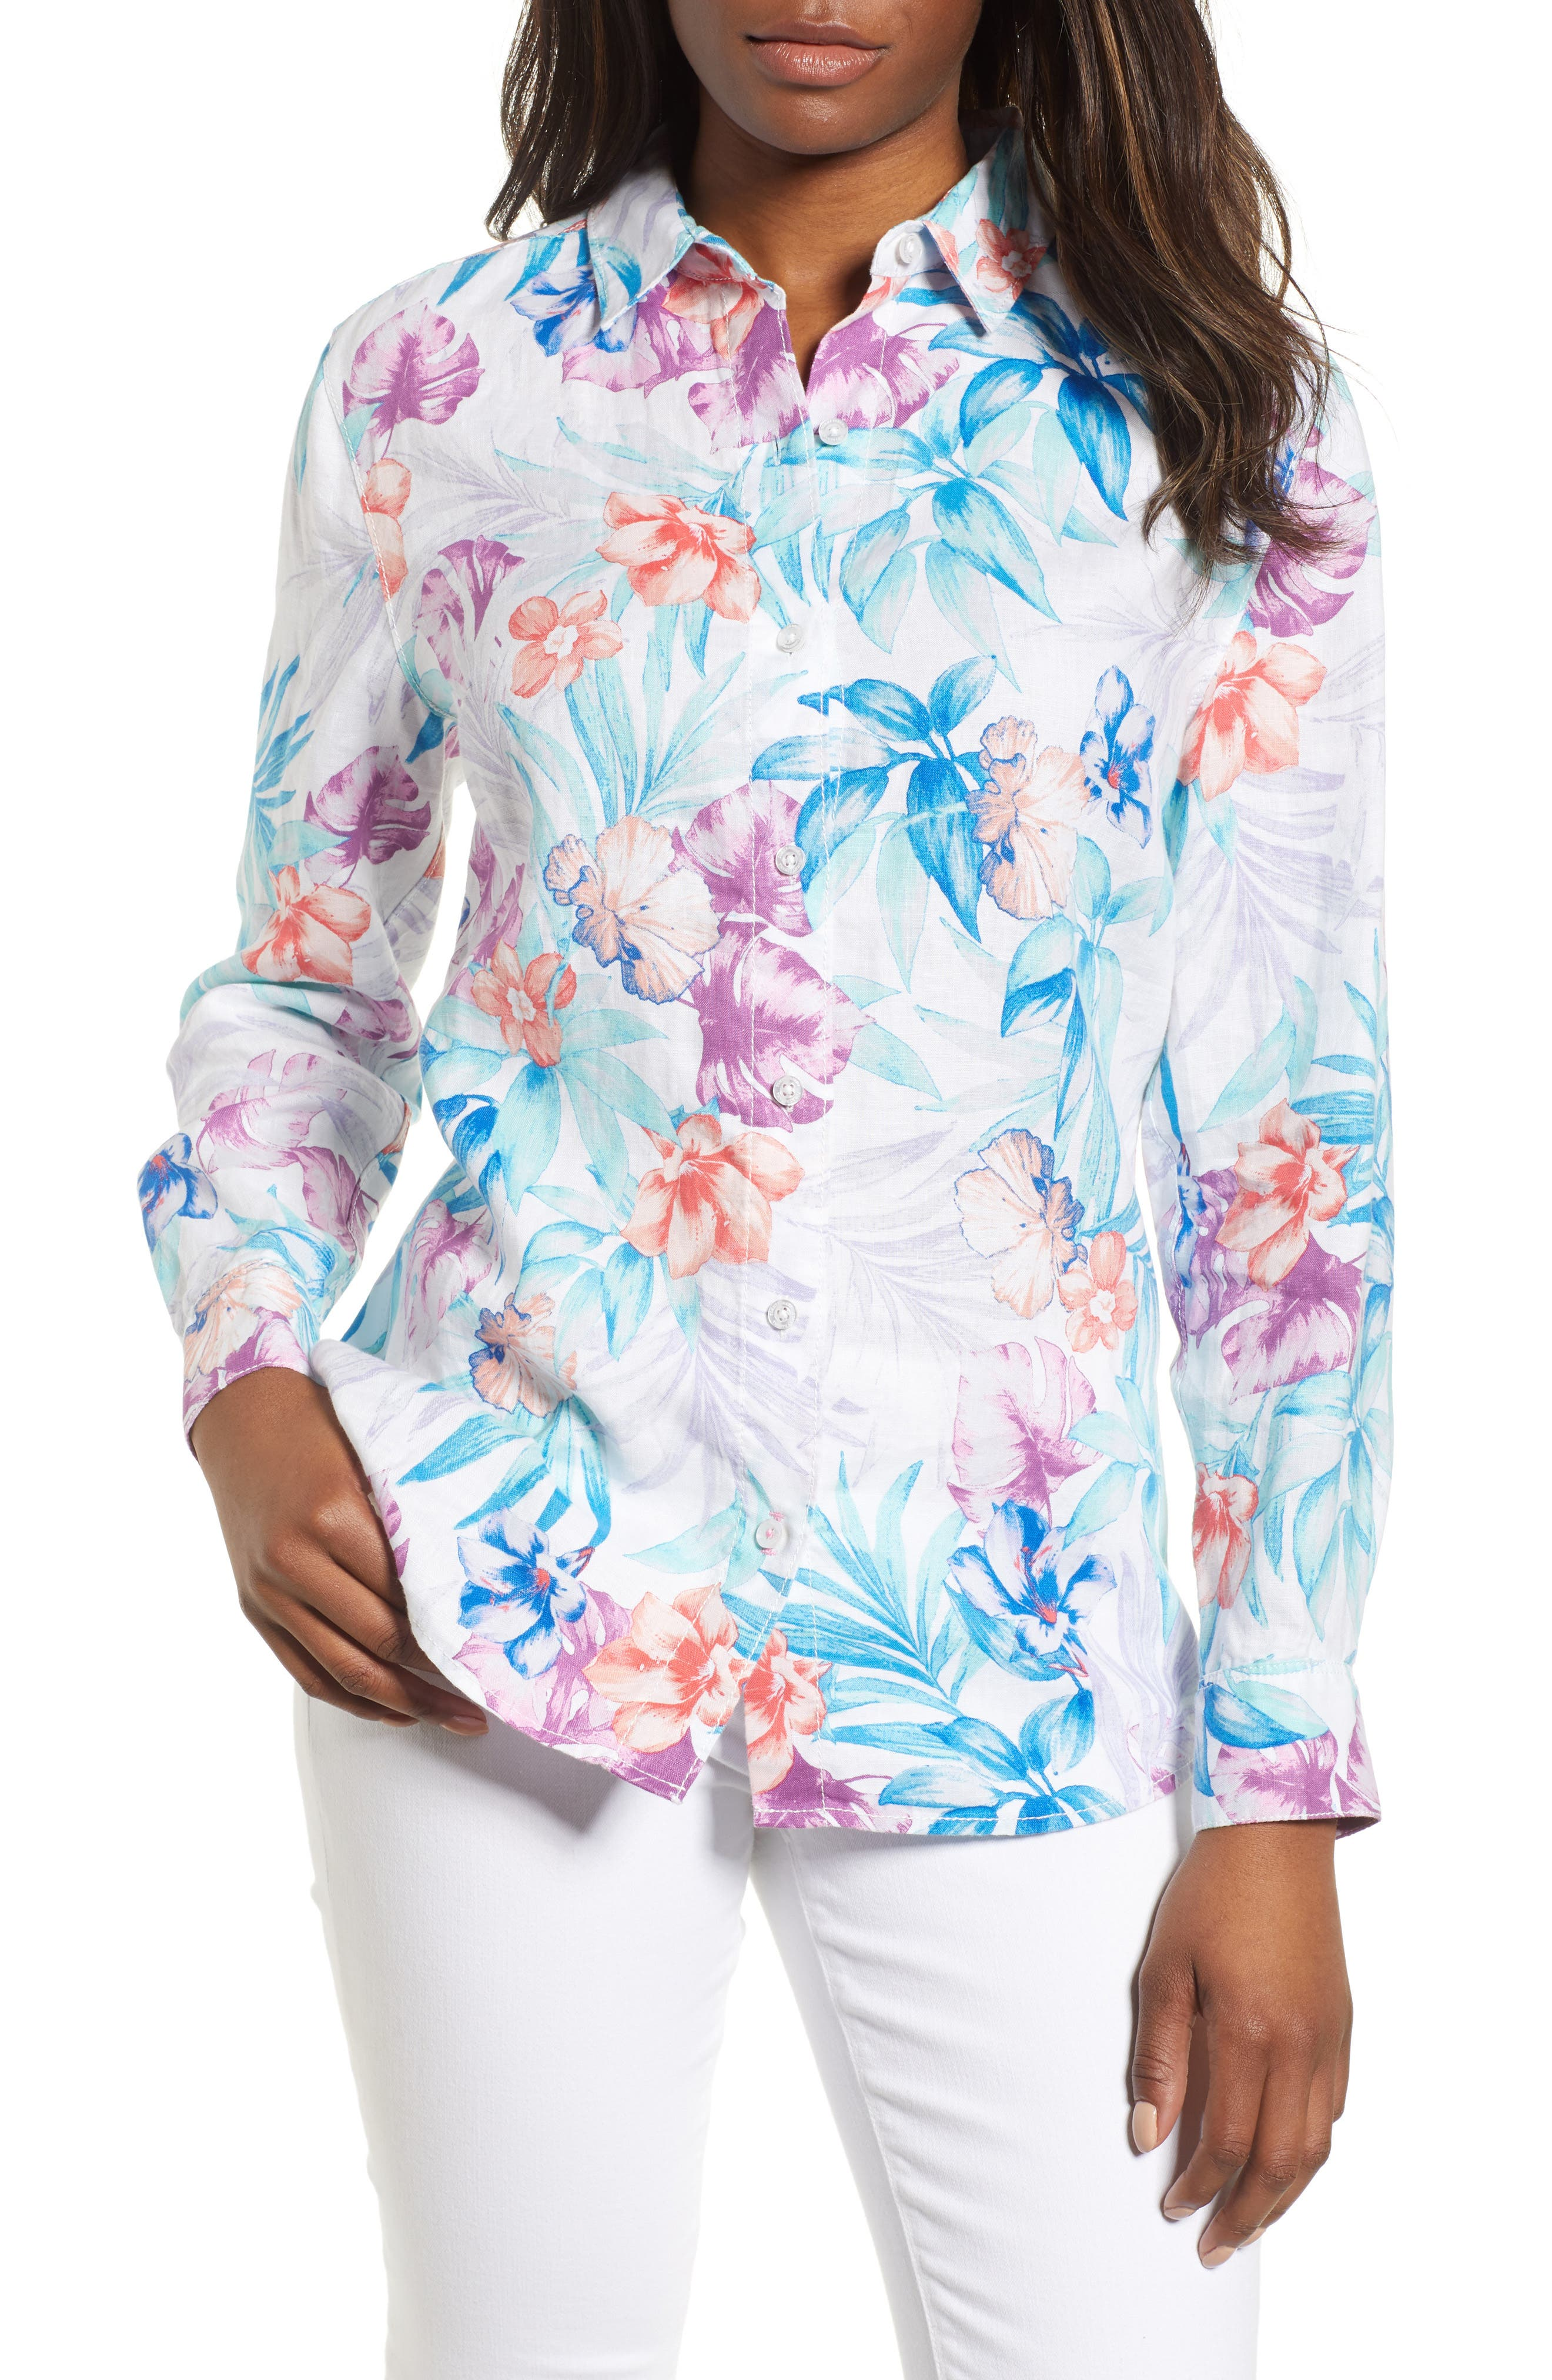 Valentina Villa Shirt,                             Main thumbnail 1, color,                             White